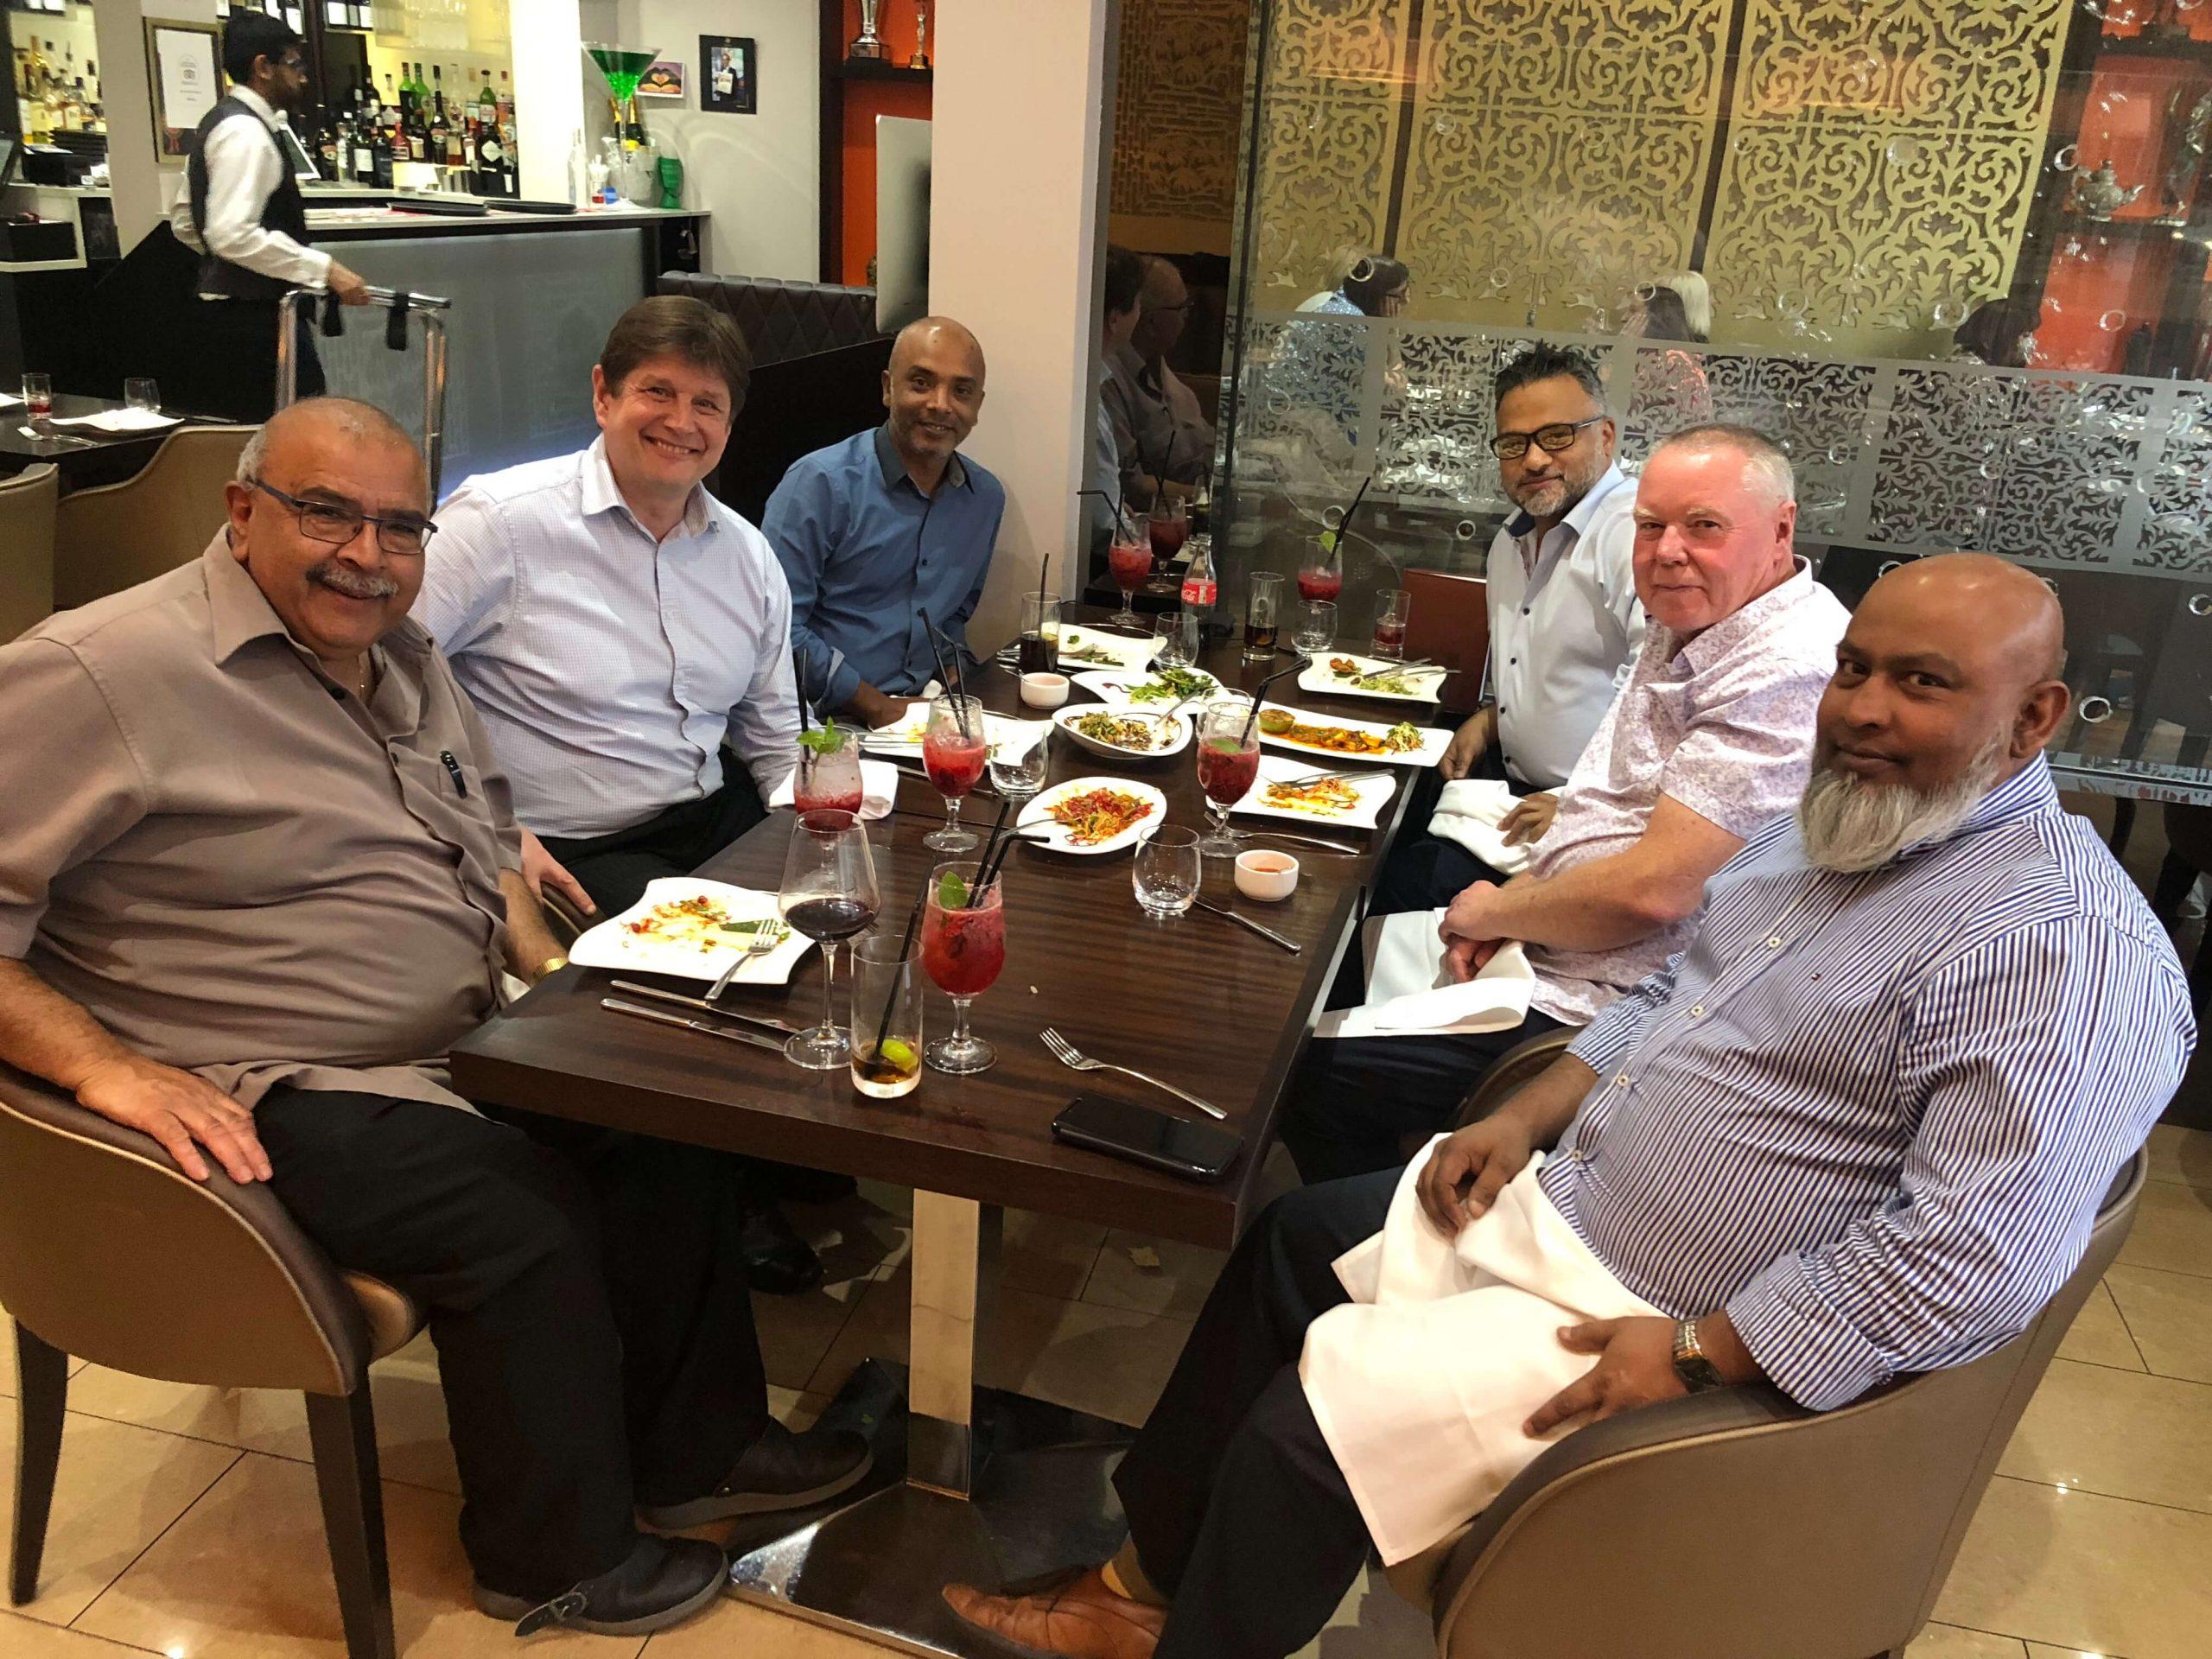 UKCC Executive Team Meeting at the Bayleaf Restaurant